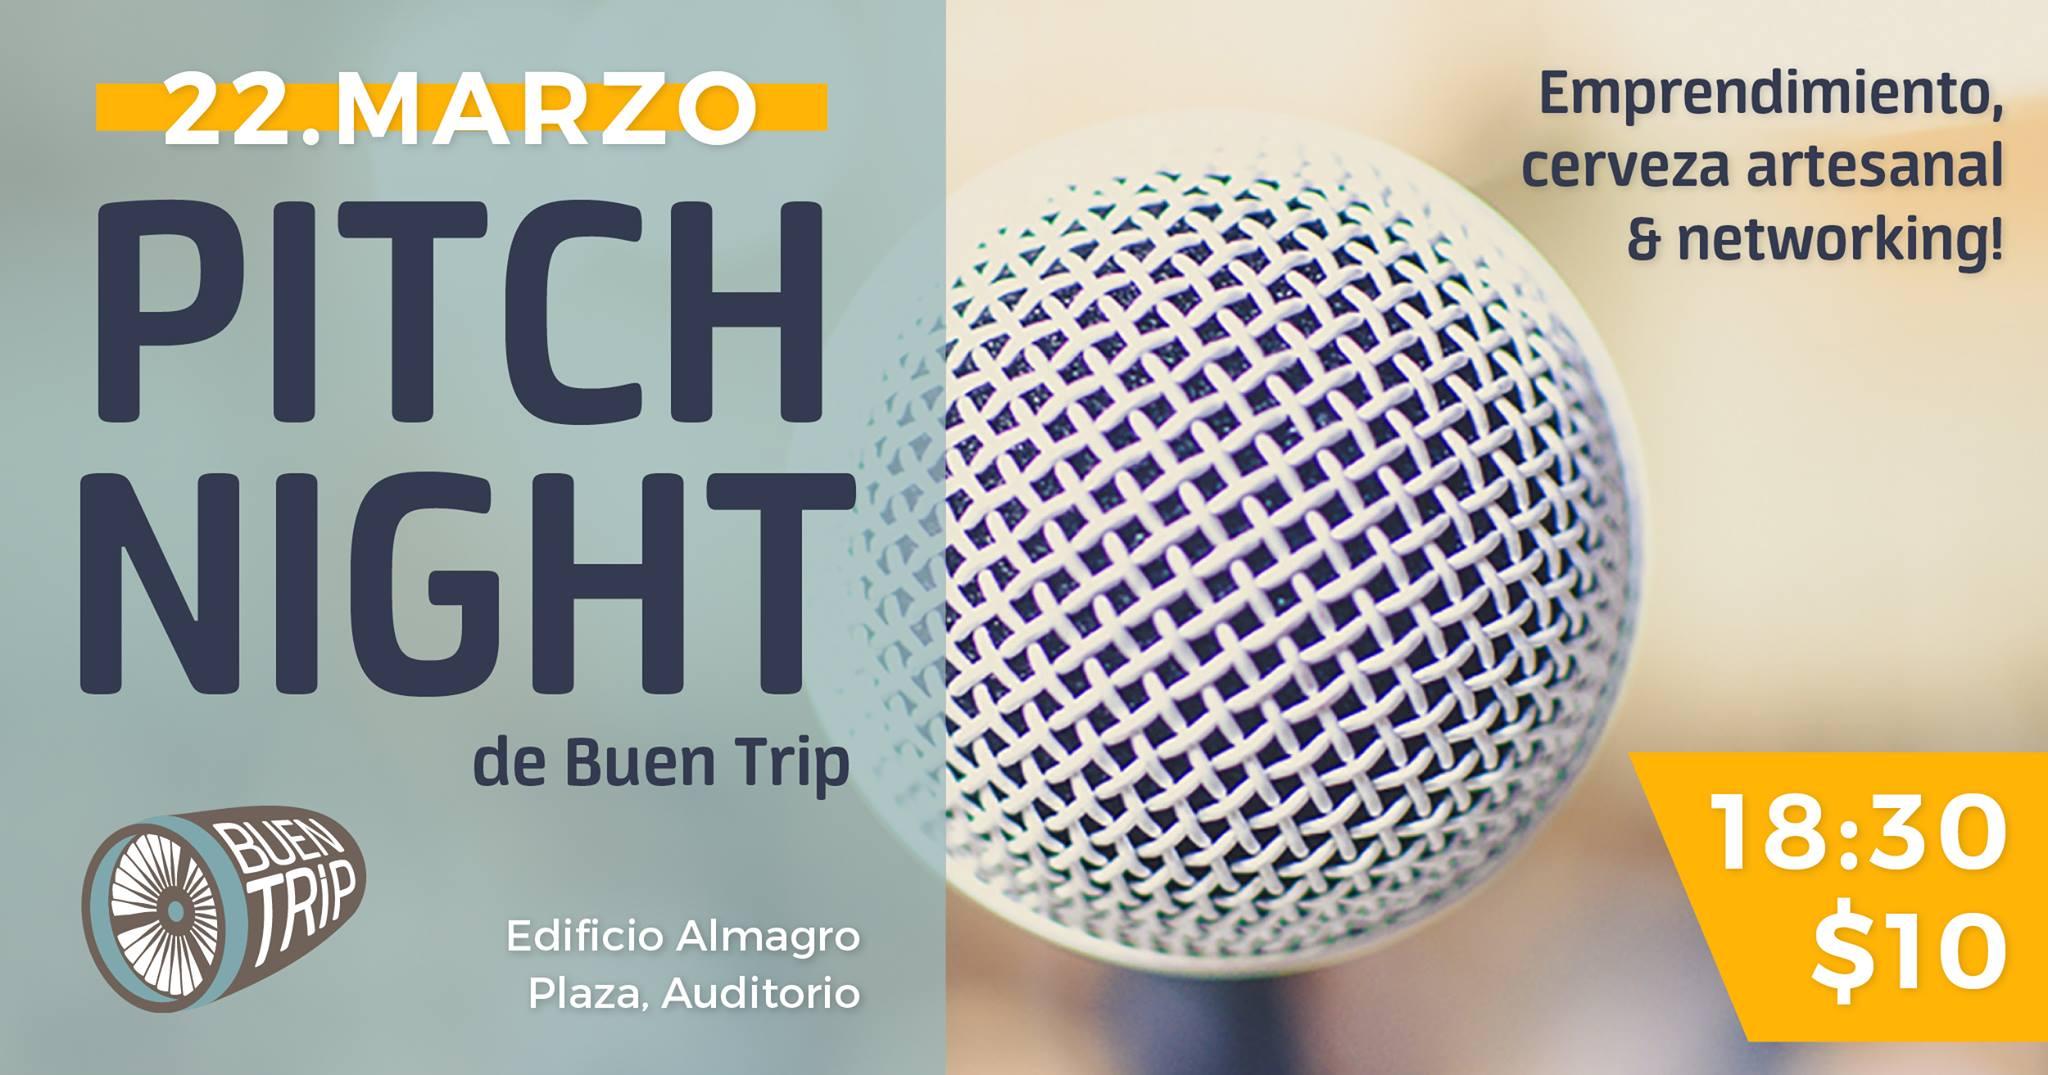 Pitch Night de Bue Trip Marzo 22, 2018